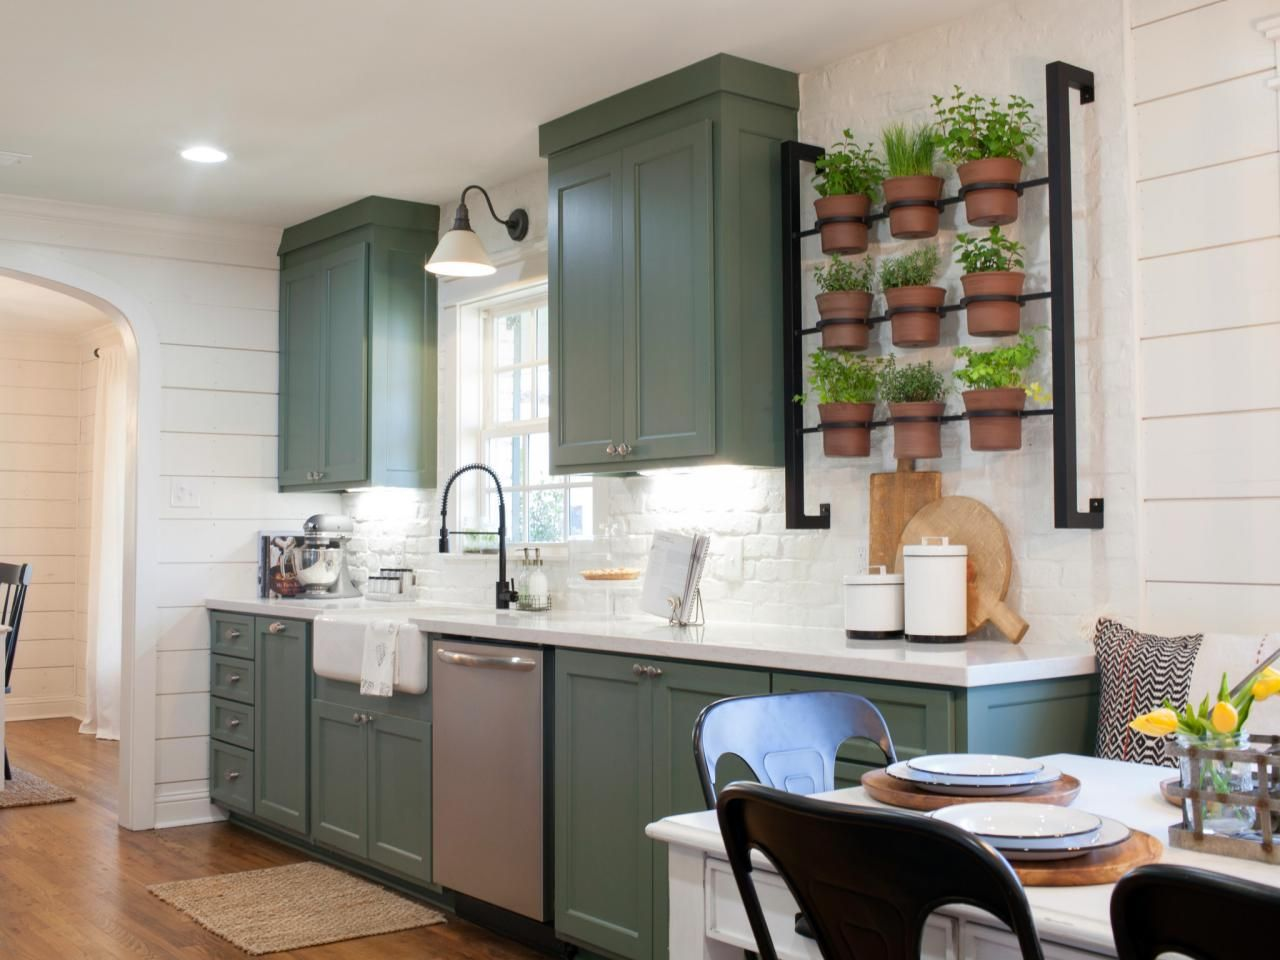 Fixer upper white kitchen cabinet color - Fixer Upper Kitchen Cabinet Paint 17 Best Images About Kitchen On Pinterest Allen Roth Islands